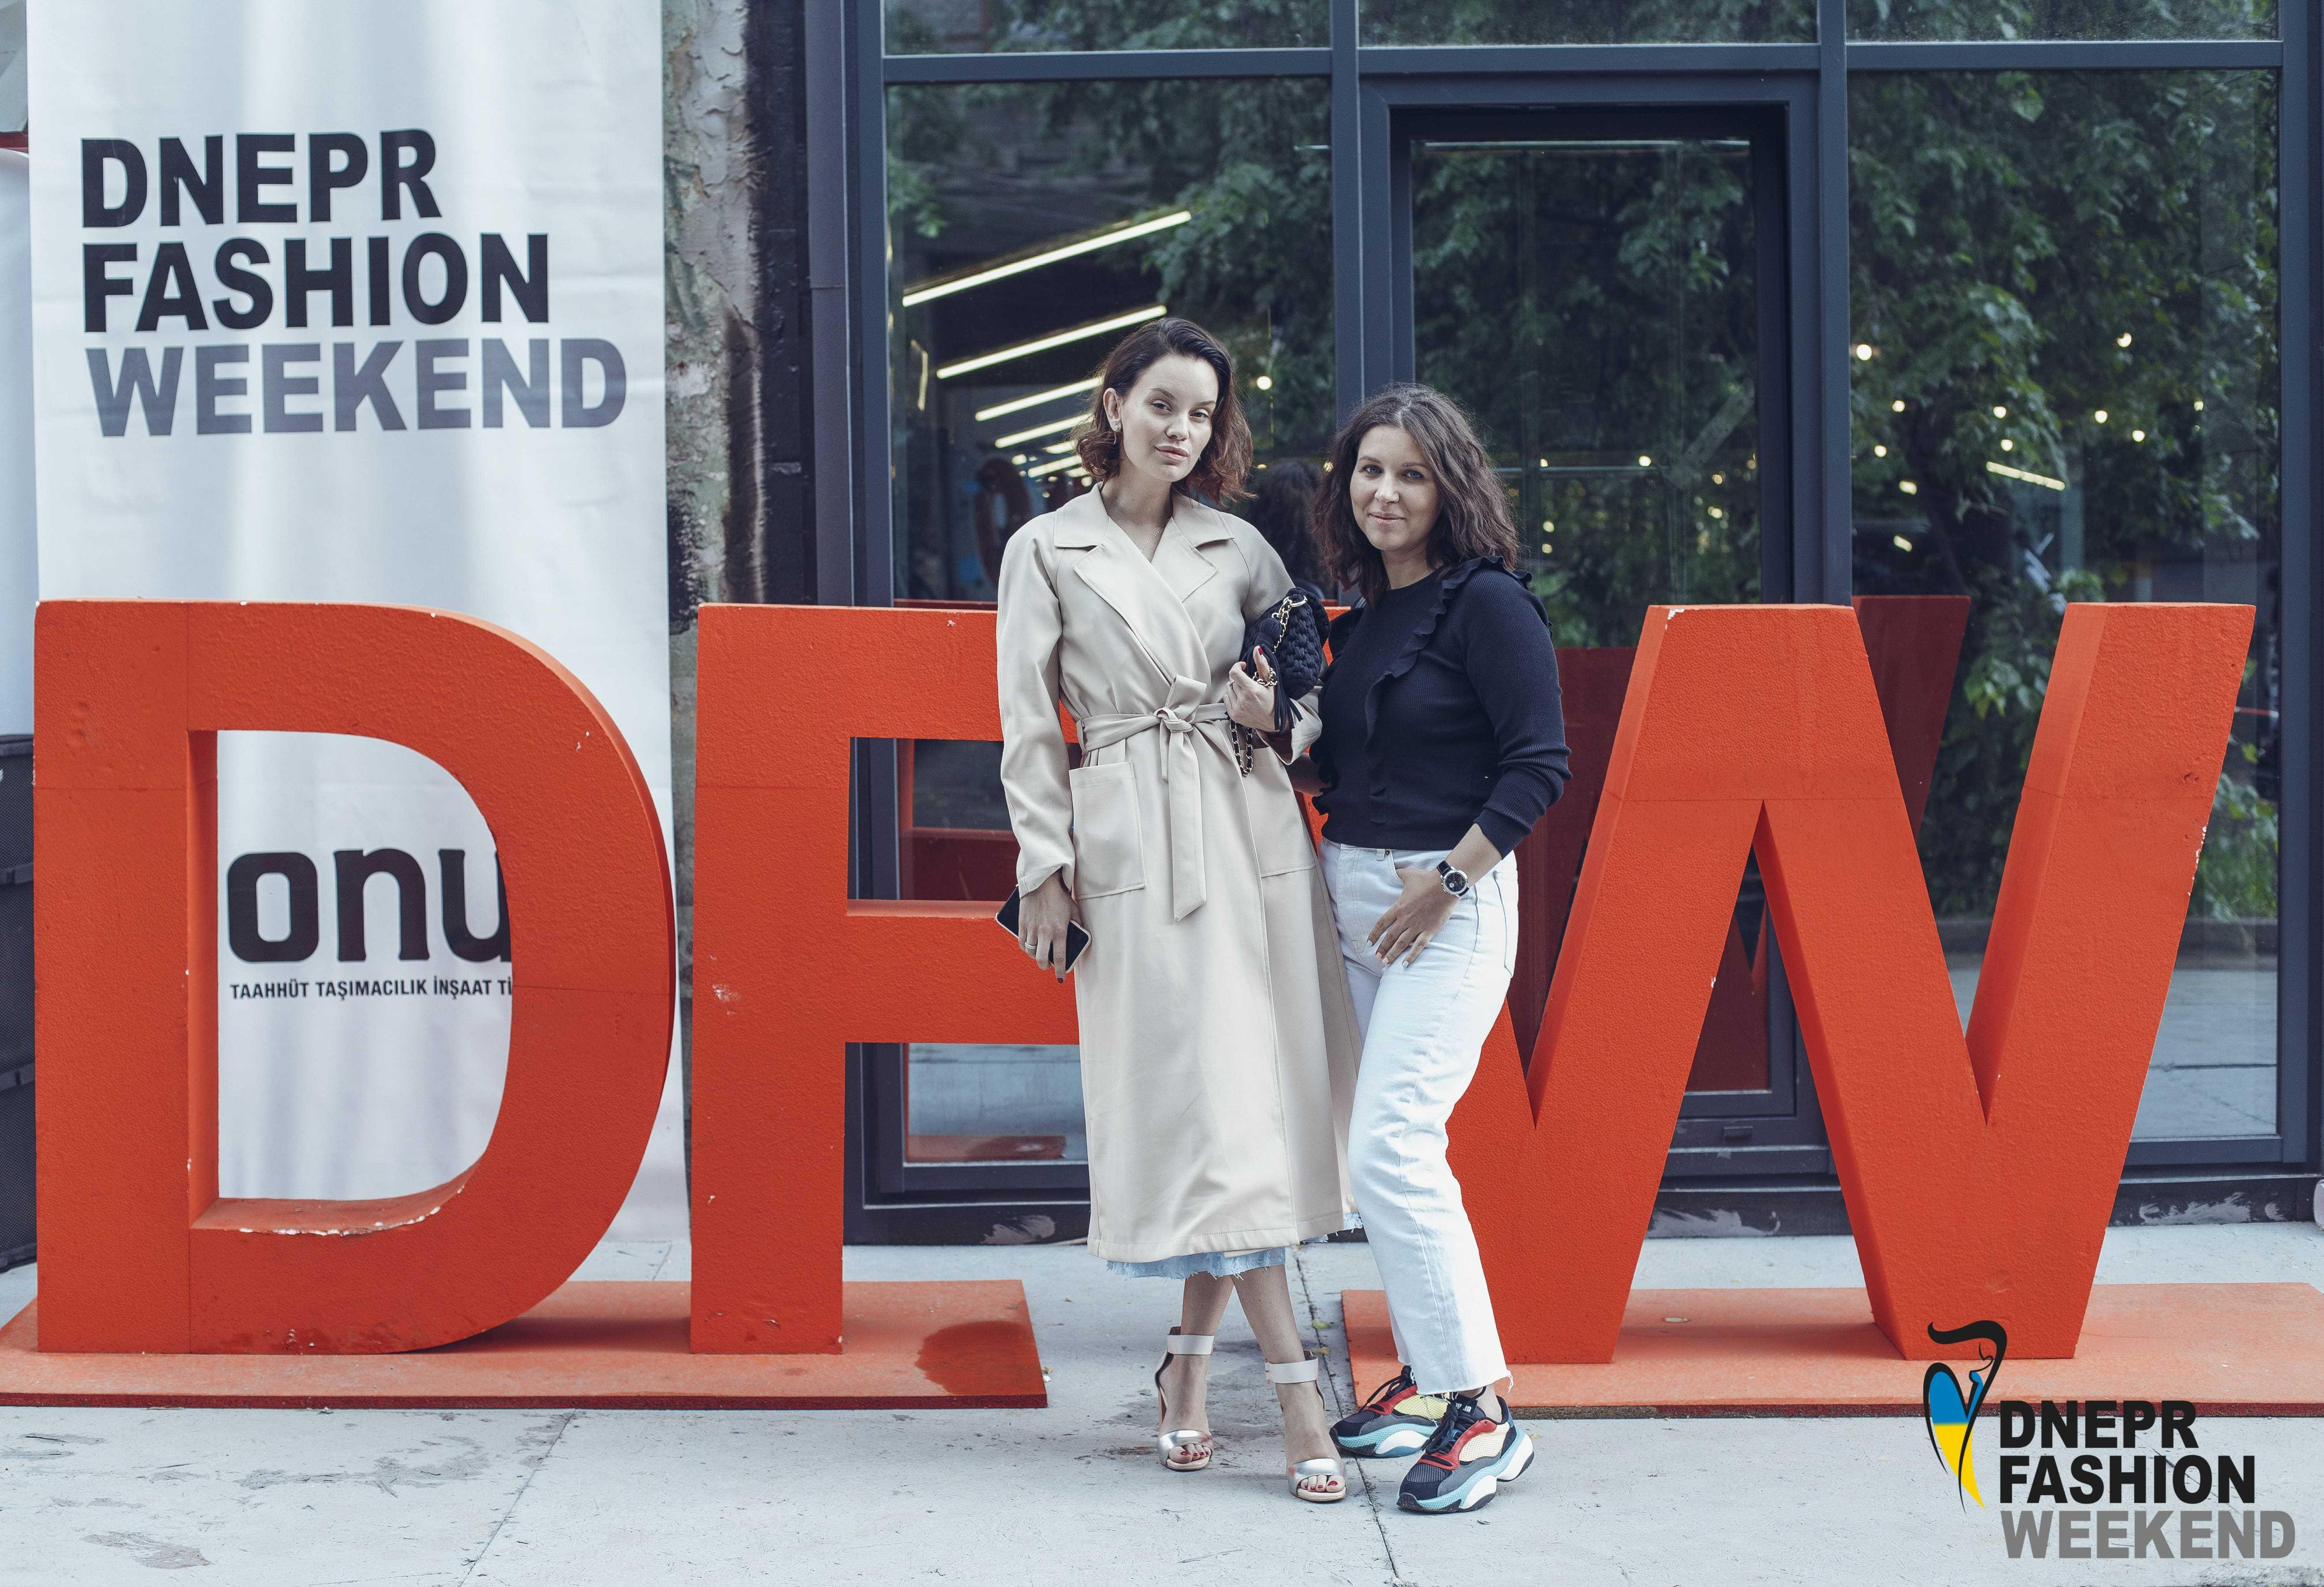 Хроники Dnepr Fashion Weekend как прошли три дня модного мероприятия 6